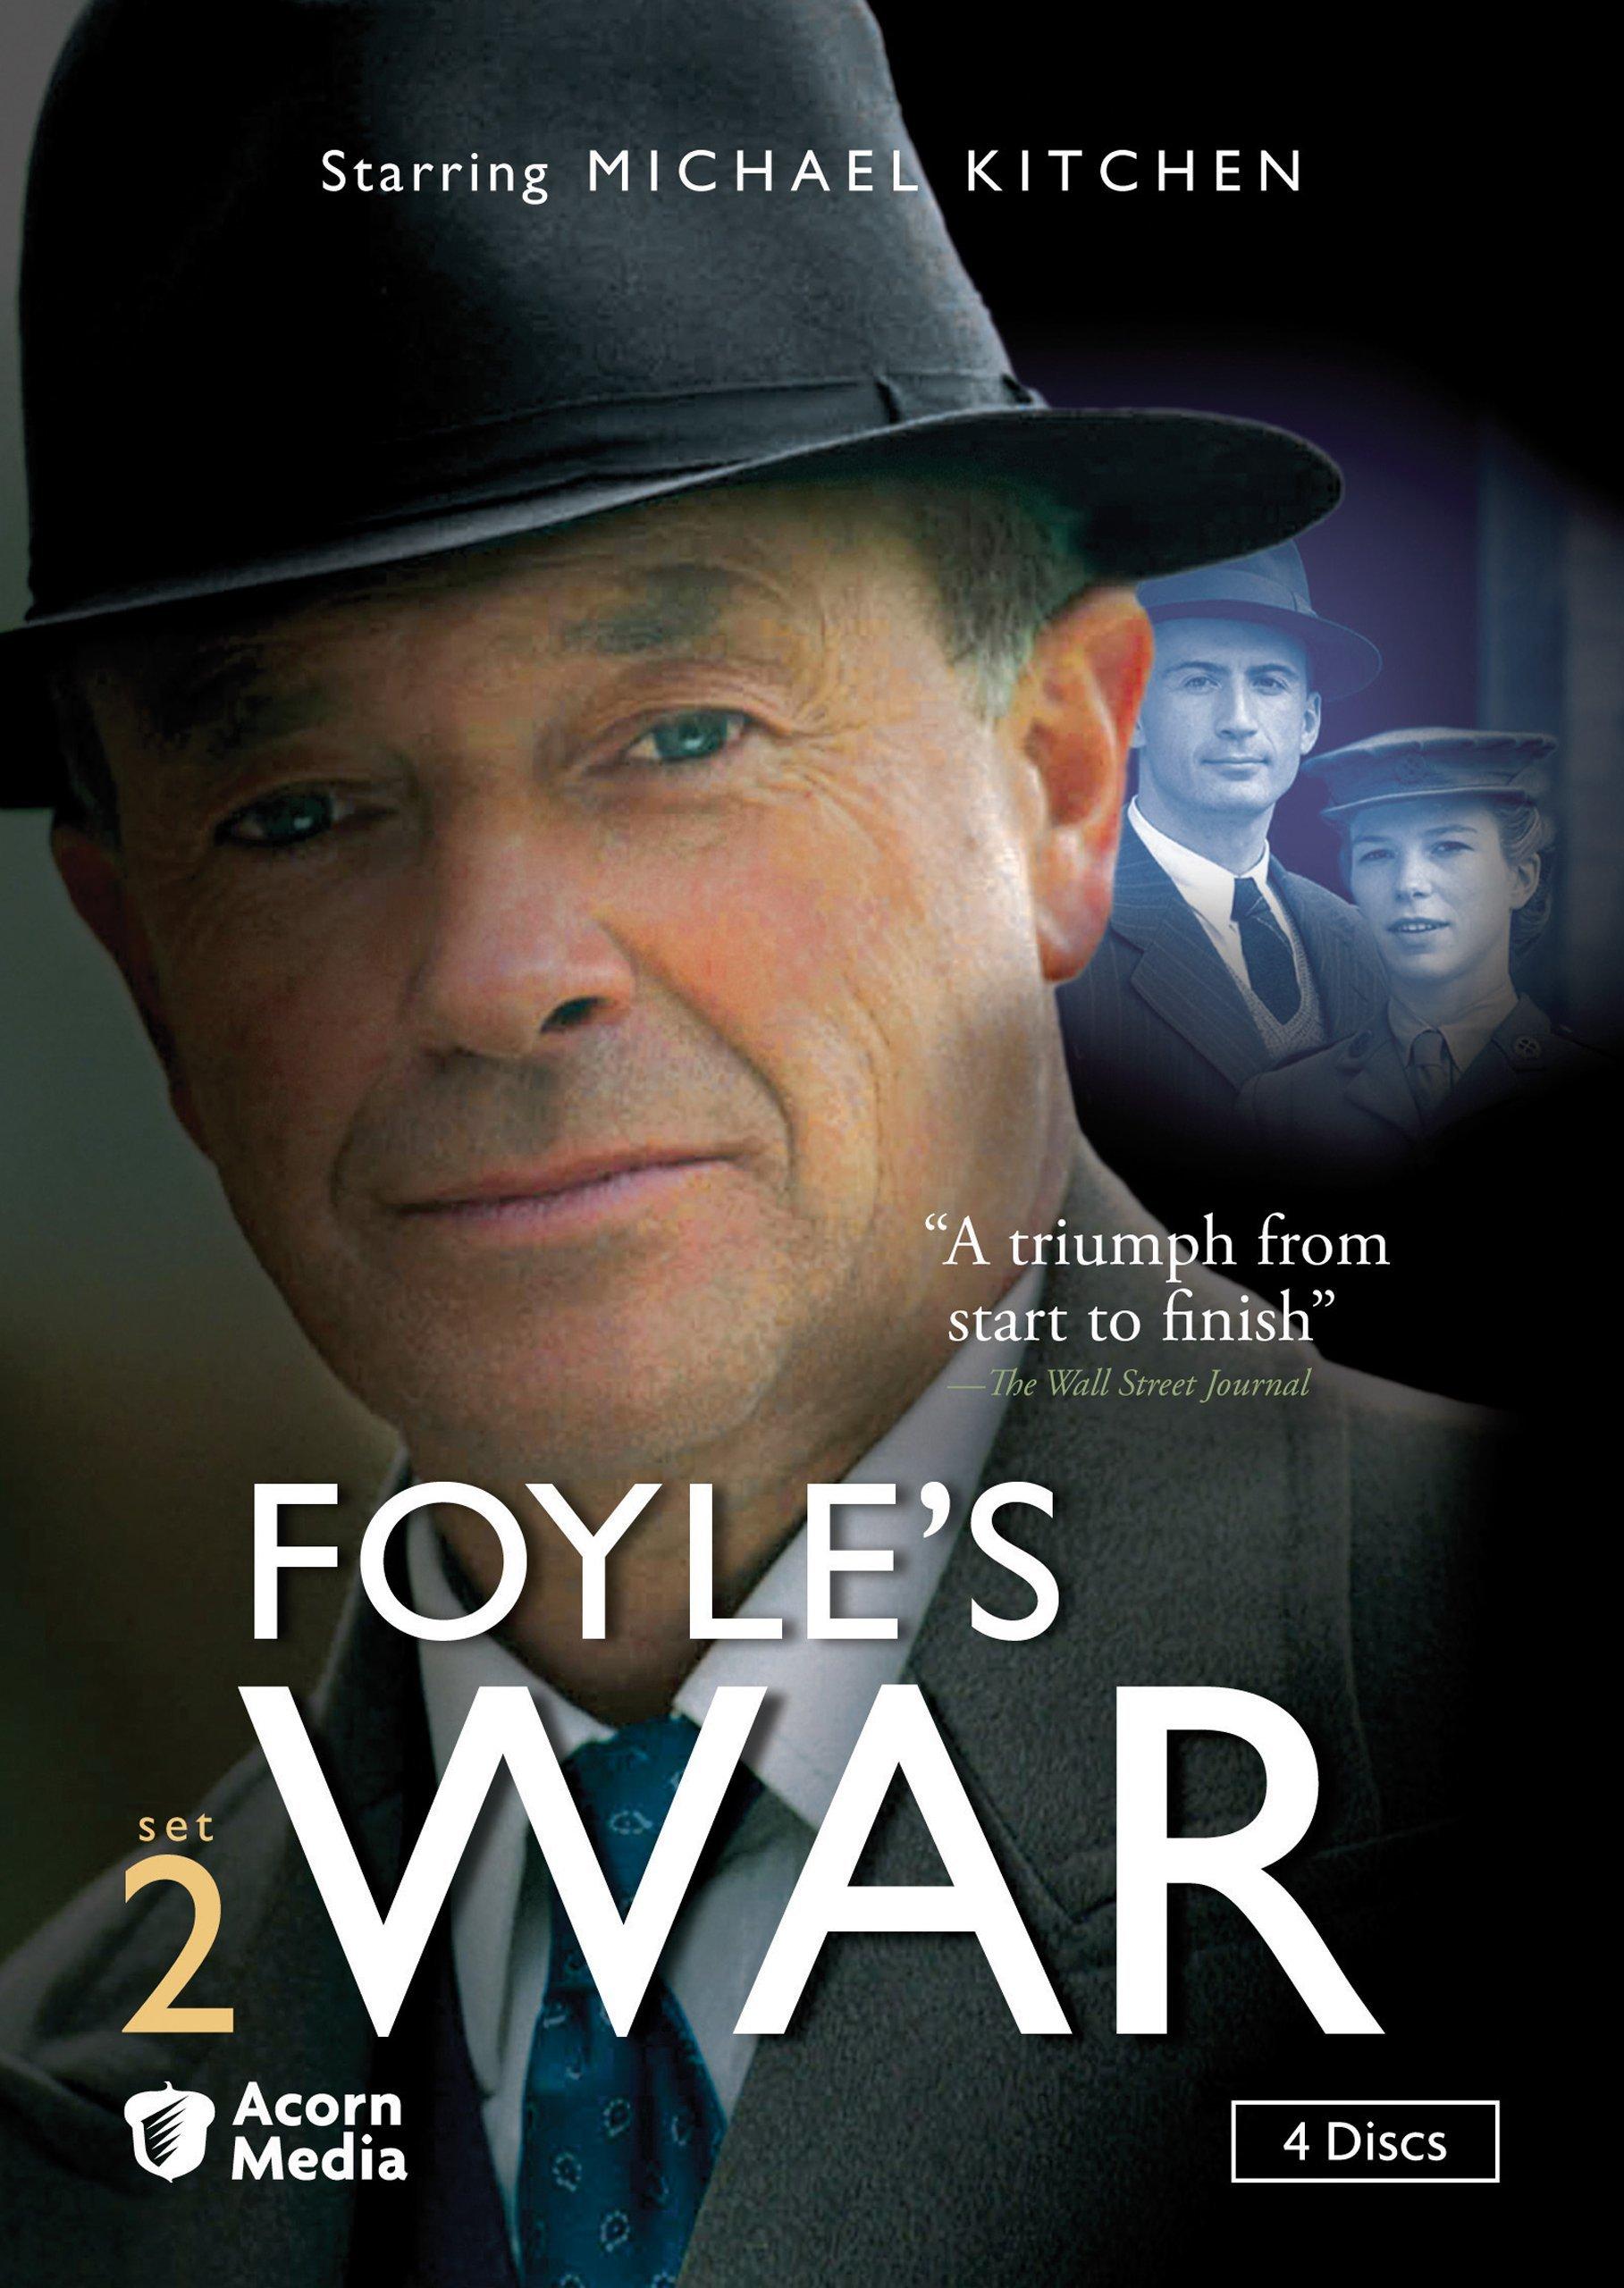 Foyle's War, Set 2